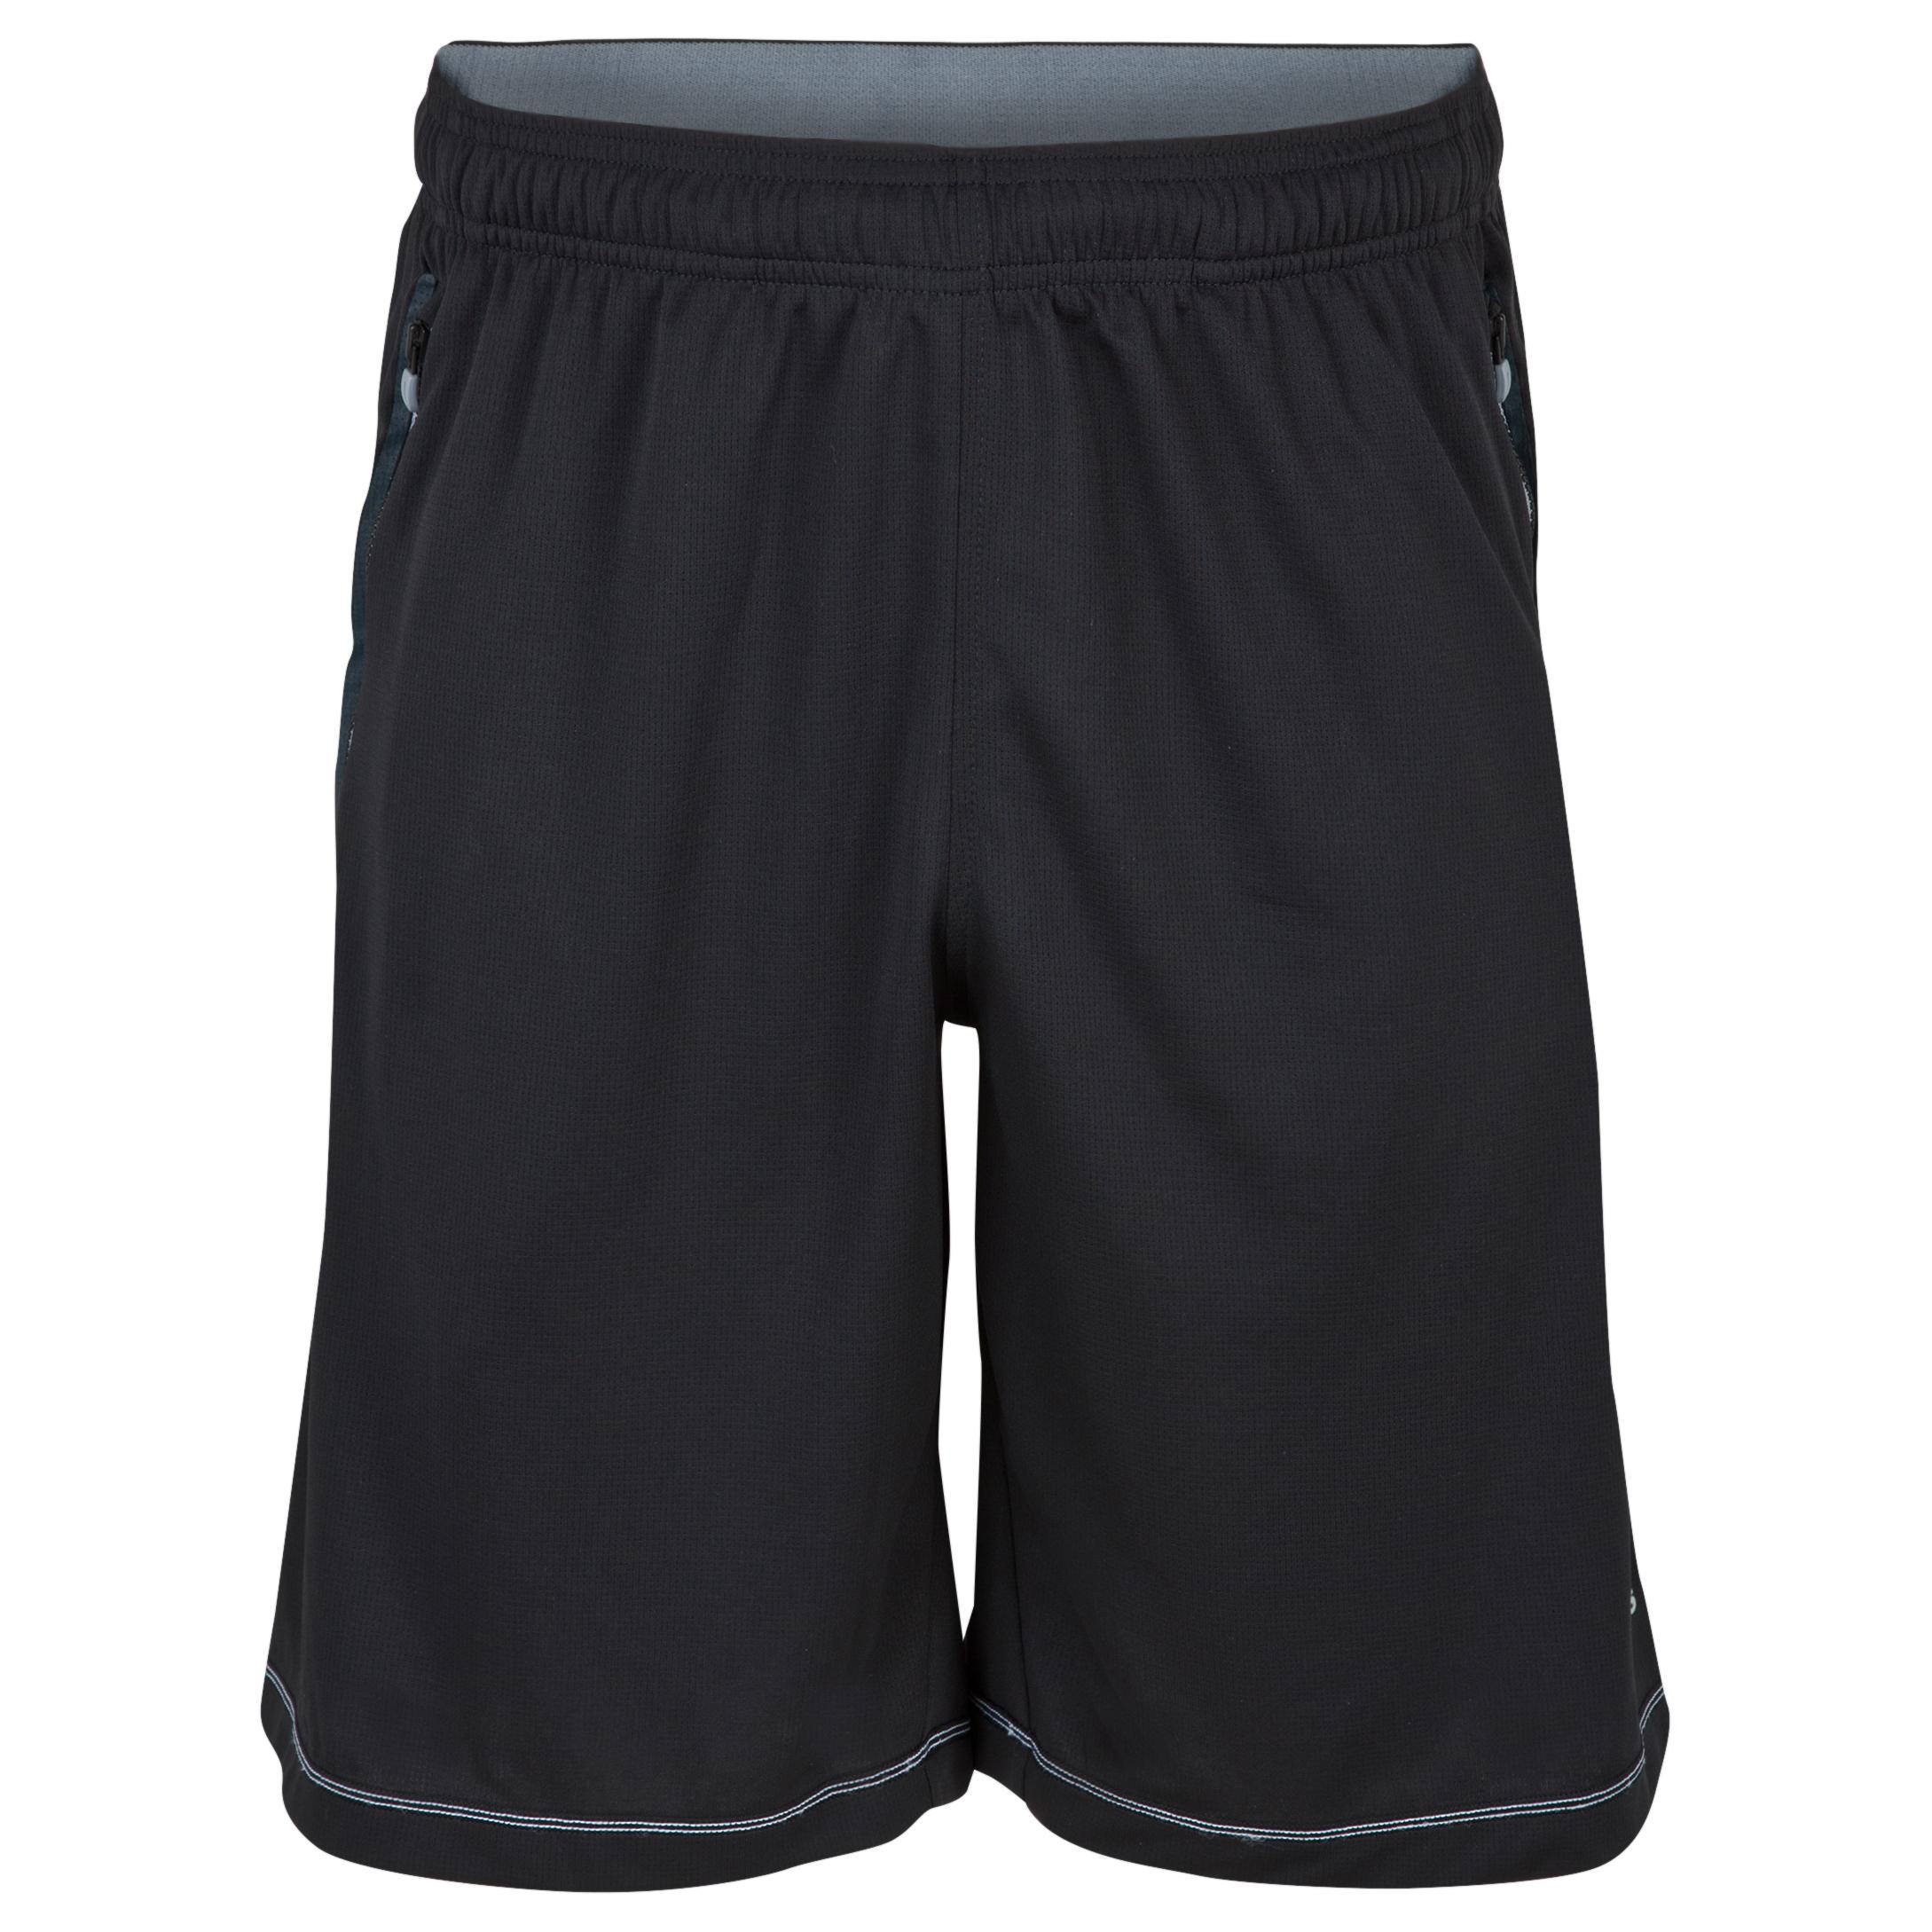 Adidas Climachill Shorts Black